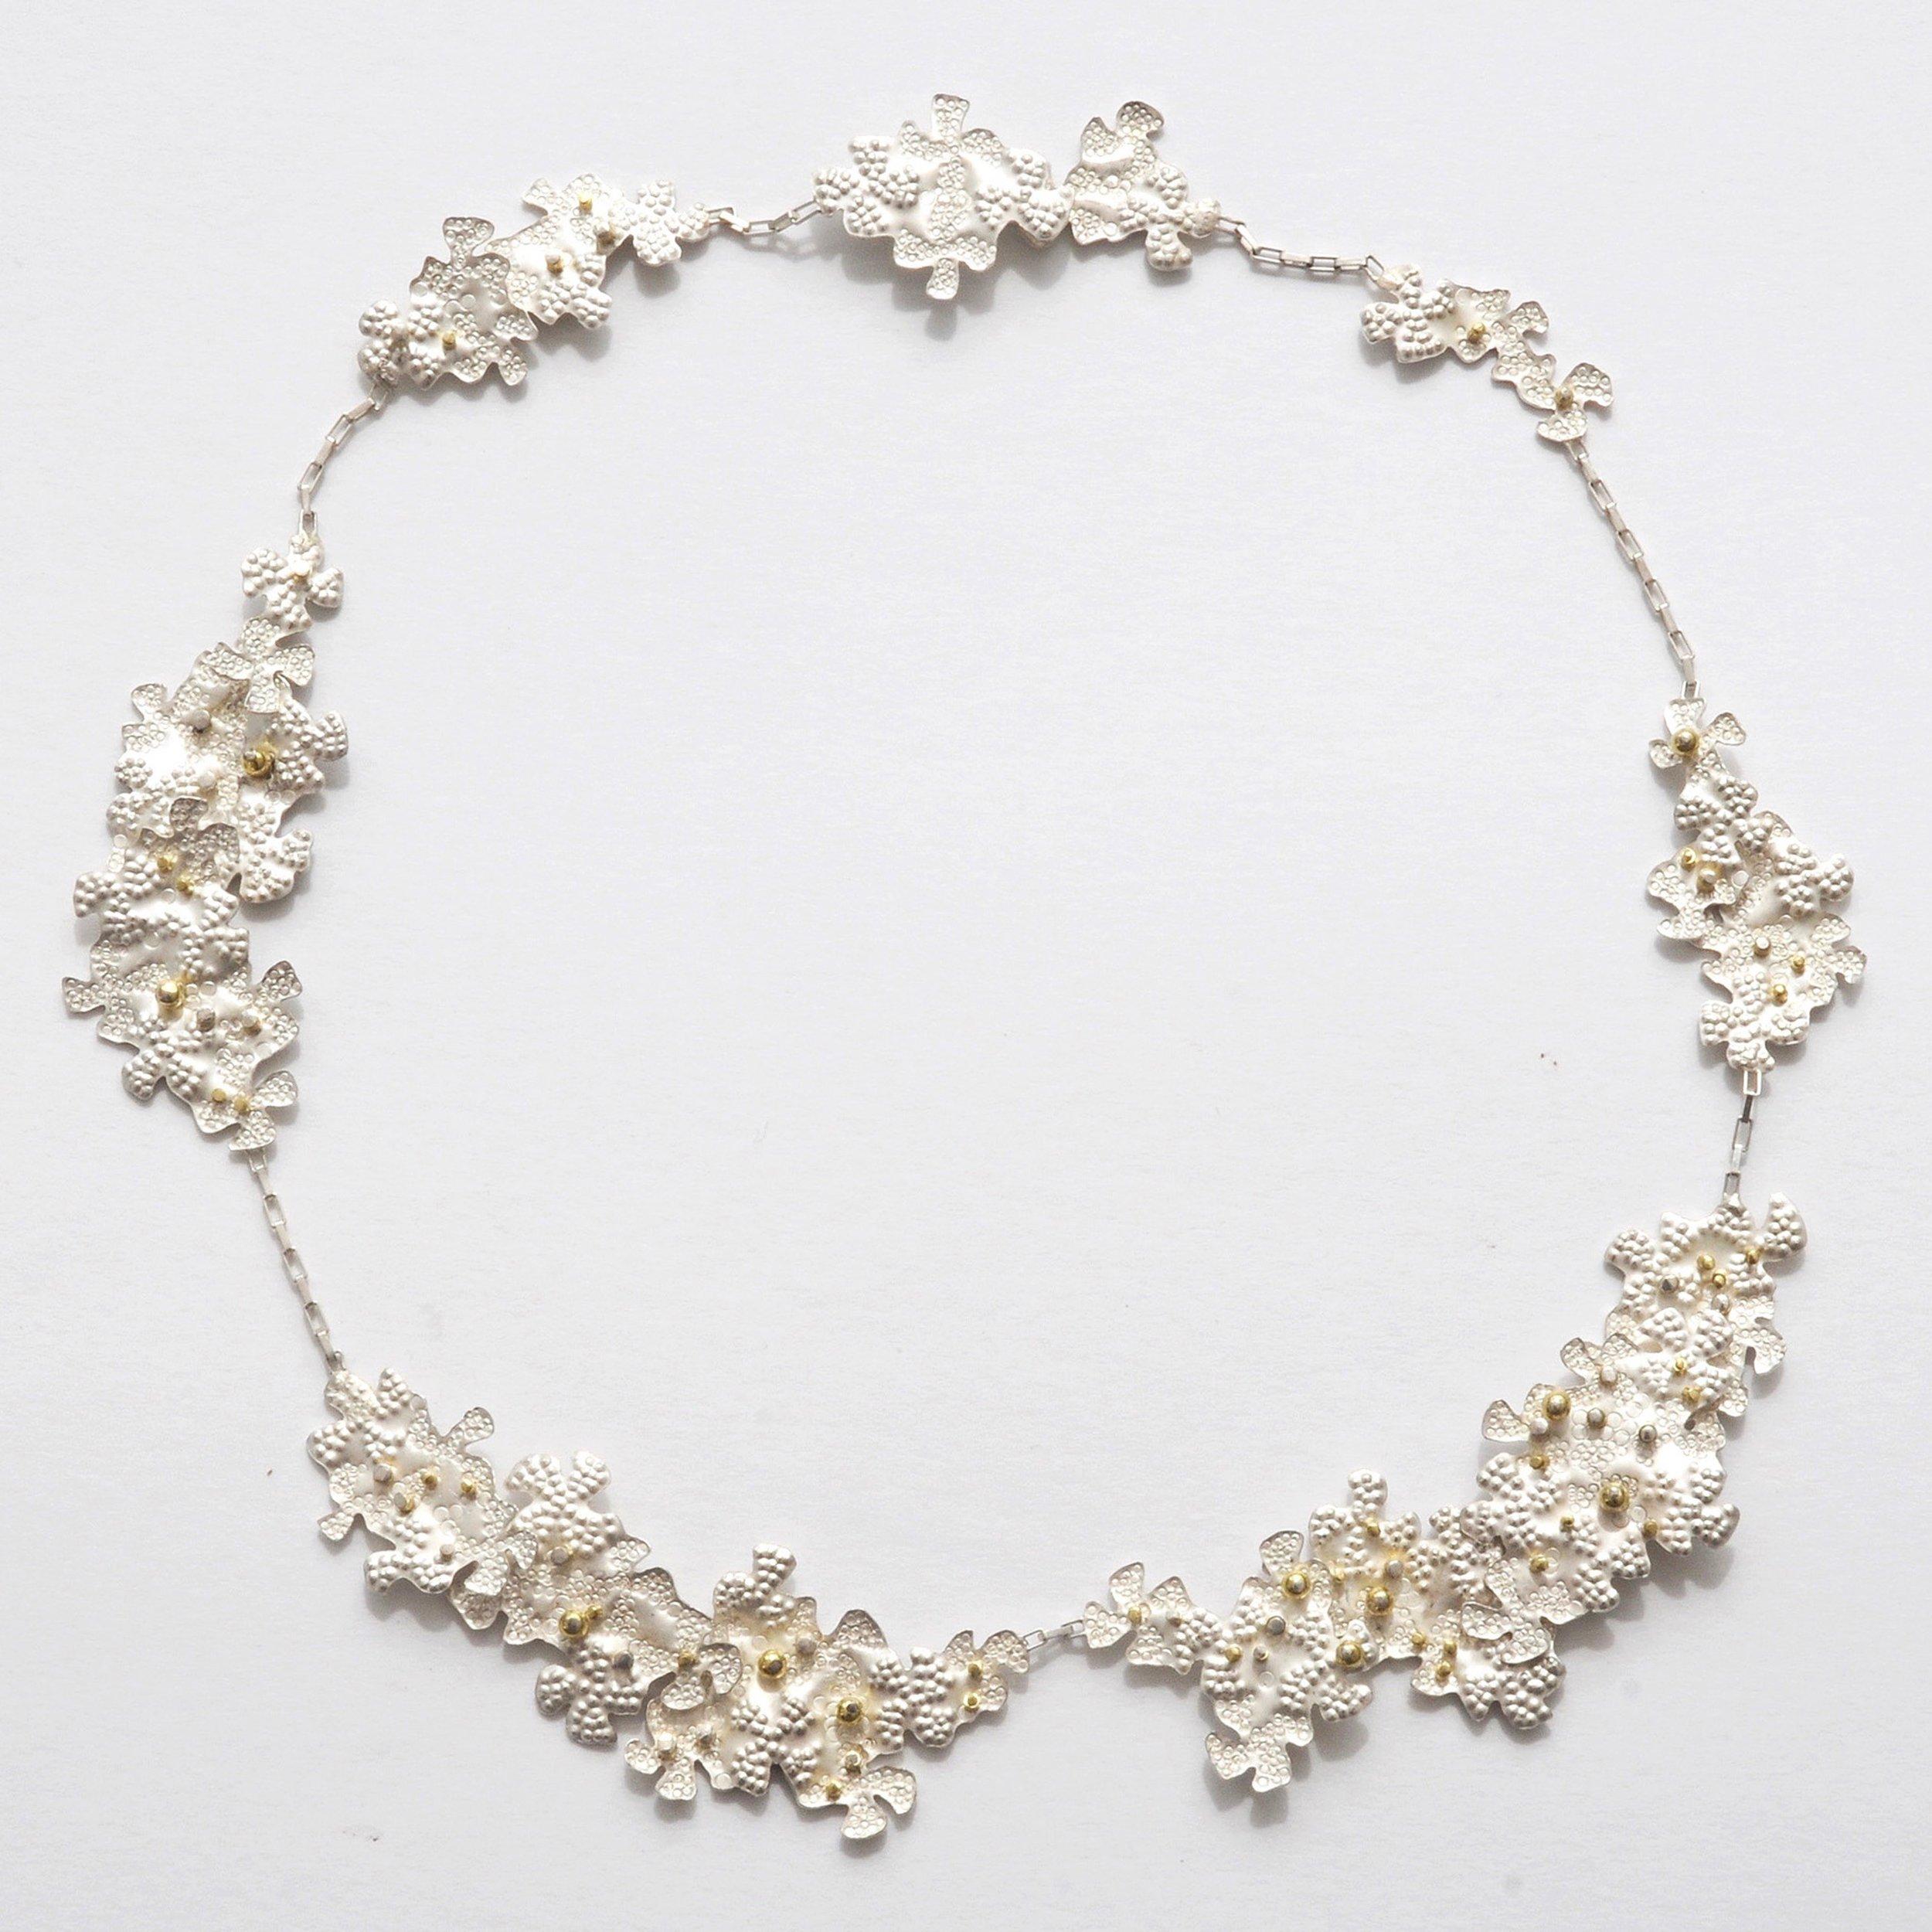 Rebecca Burt Freckled Blooms.jpg